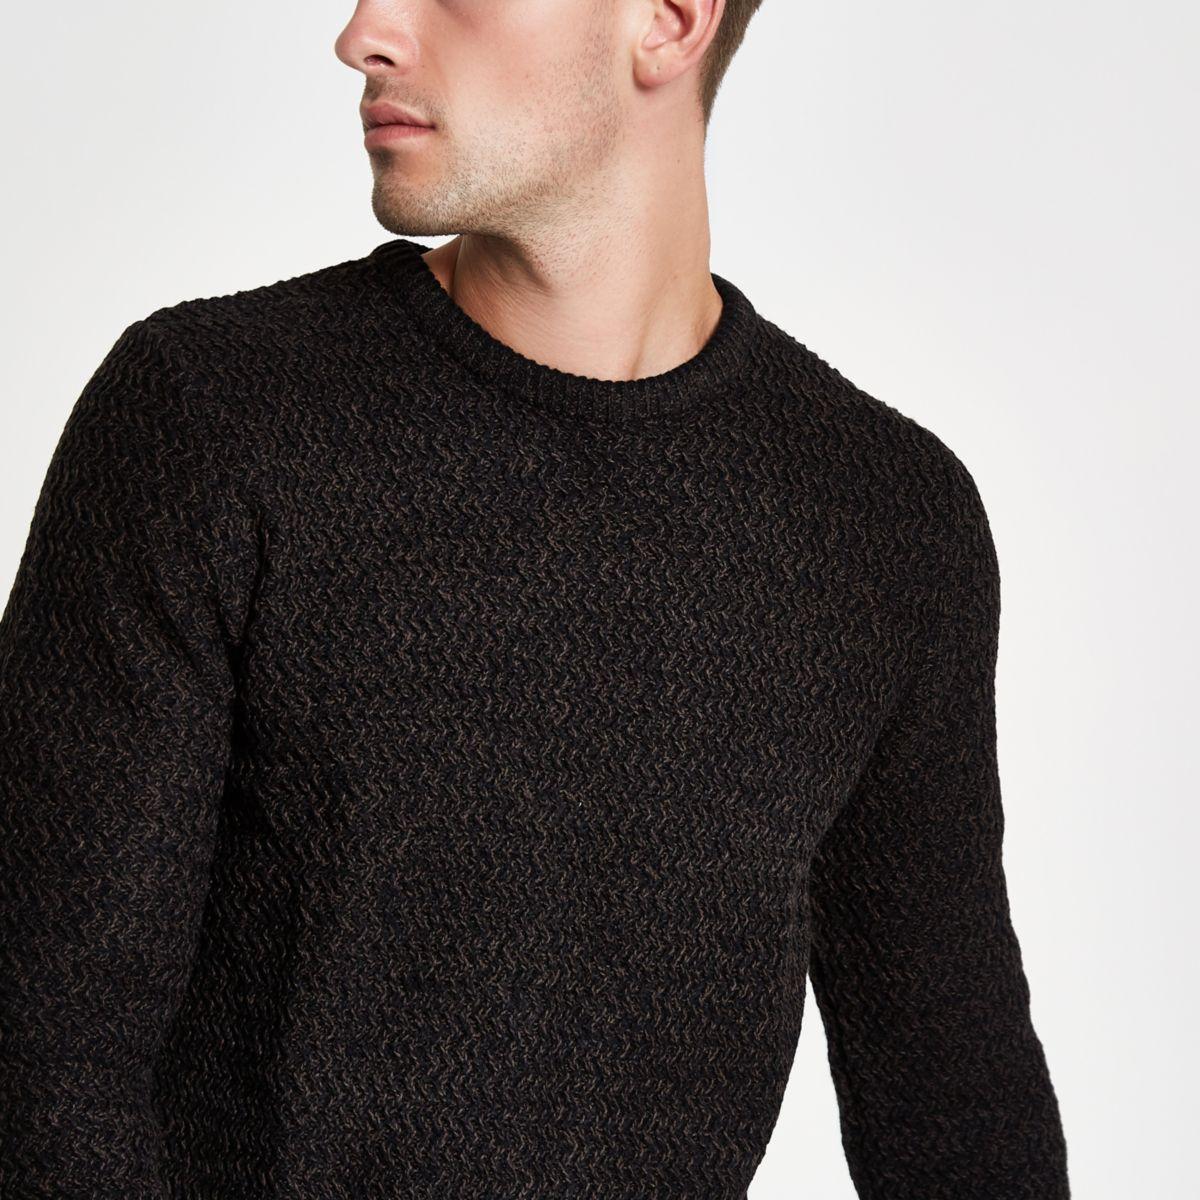 Black knit slim fit crew neck sweater